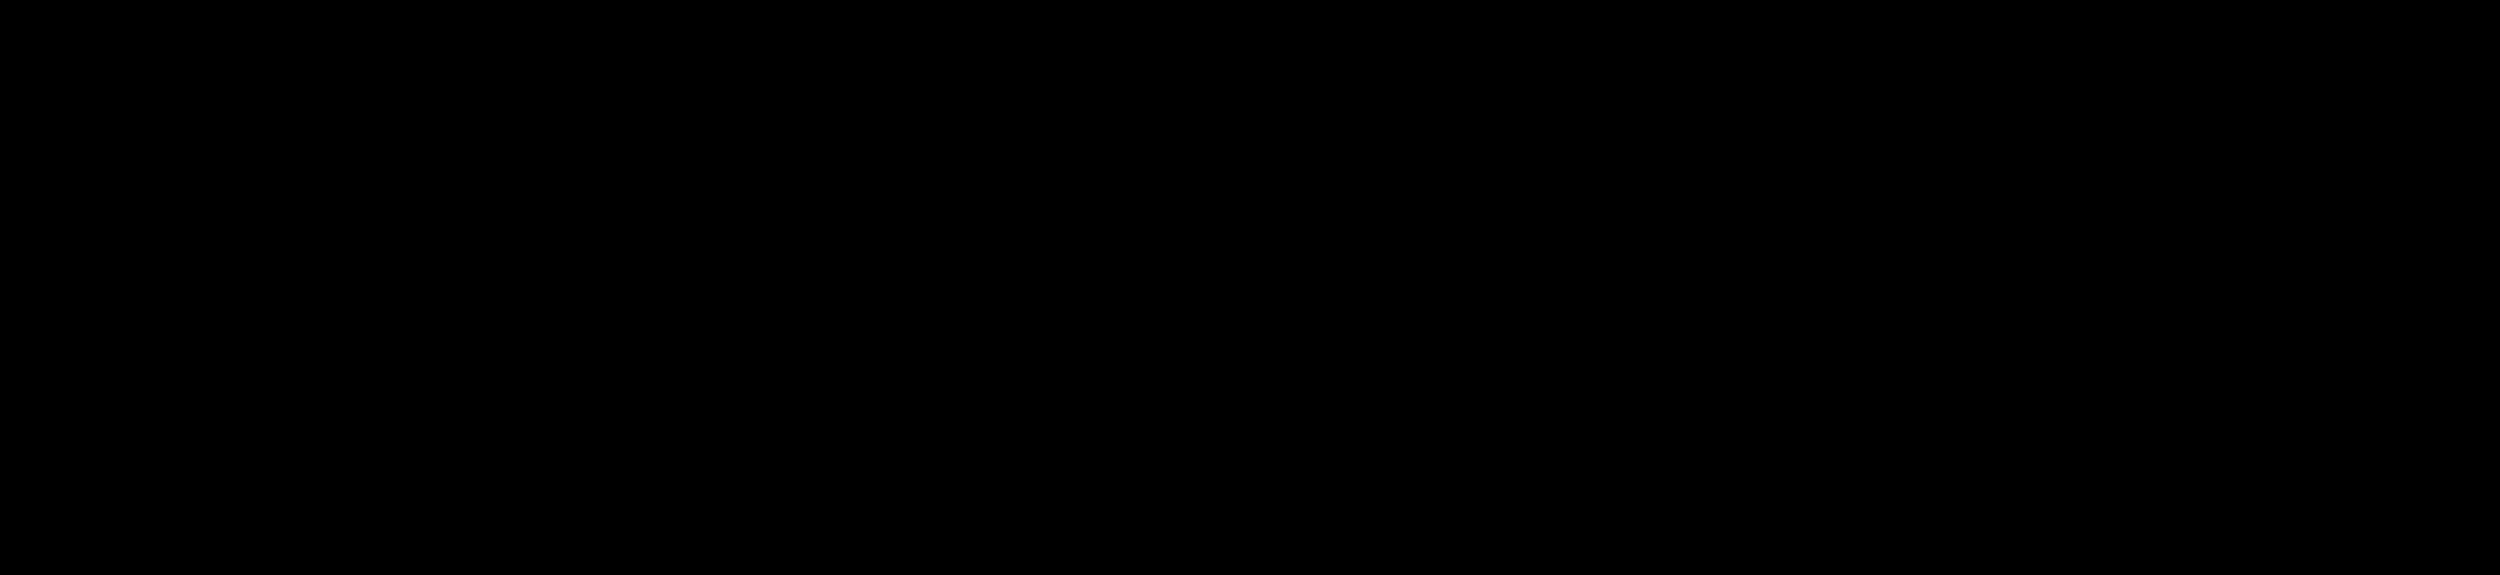 Citi Habitats Logo.png